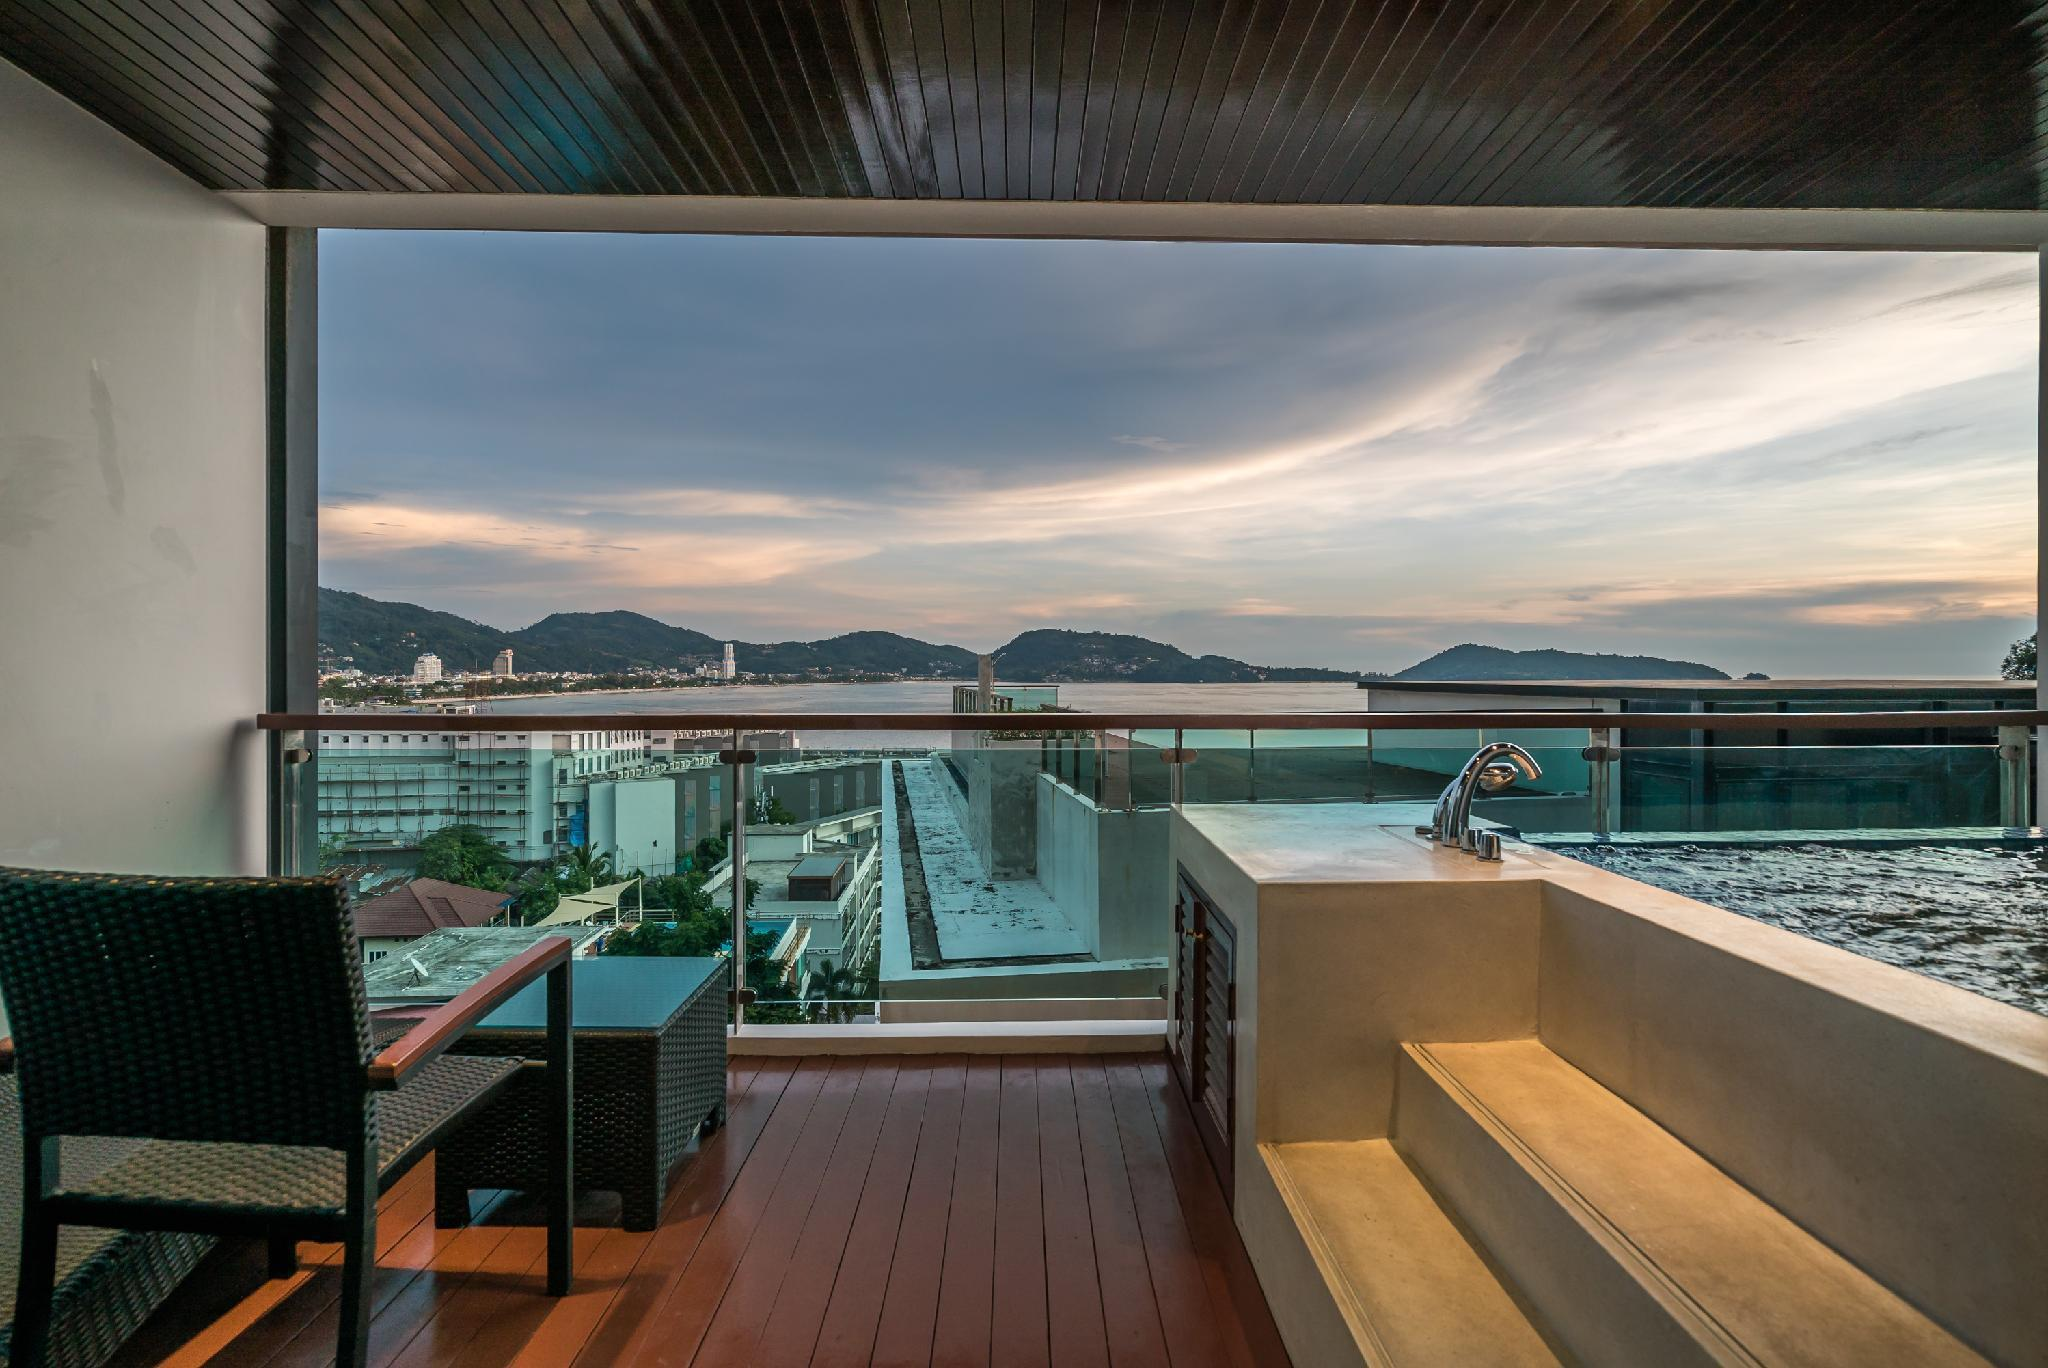 Private pool sea view apartment on Kalim bay - A1 อพาร์ตเมนต์ 1 ห้องนอน 1 ห้องน้ำส่วนตัว ขนาด 70 ตร.ม. – ป่าตอง